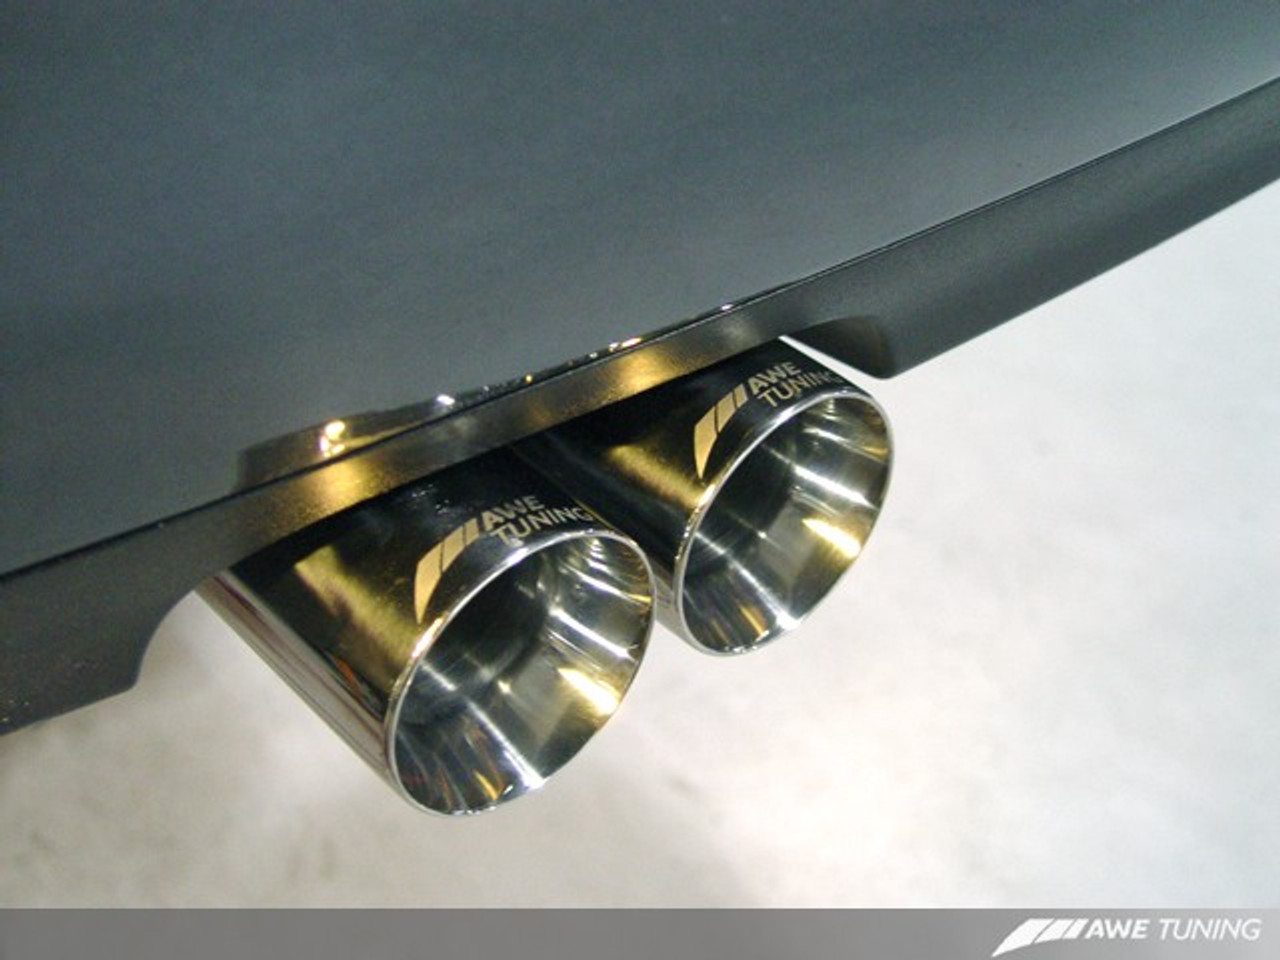 AWE Tuning Golf Mk4 1.8T Performance Exhaust